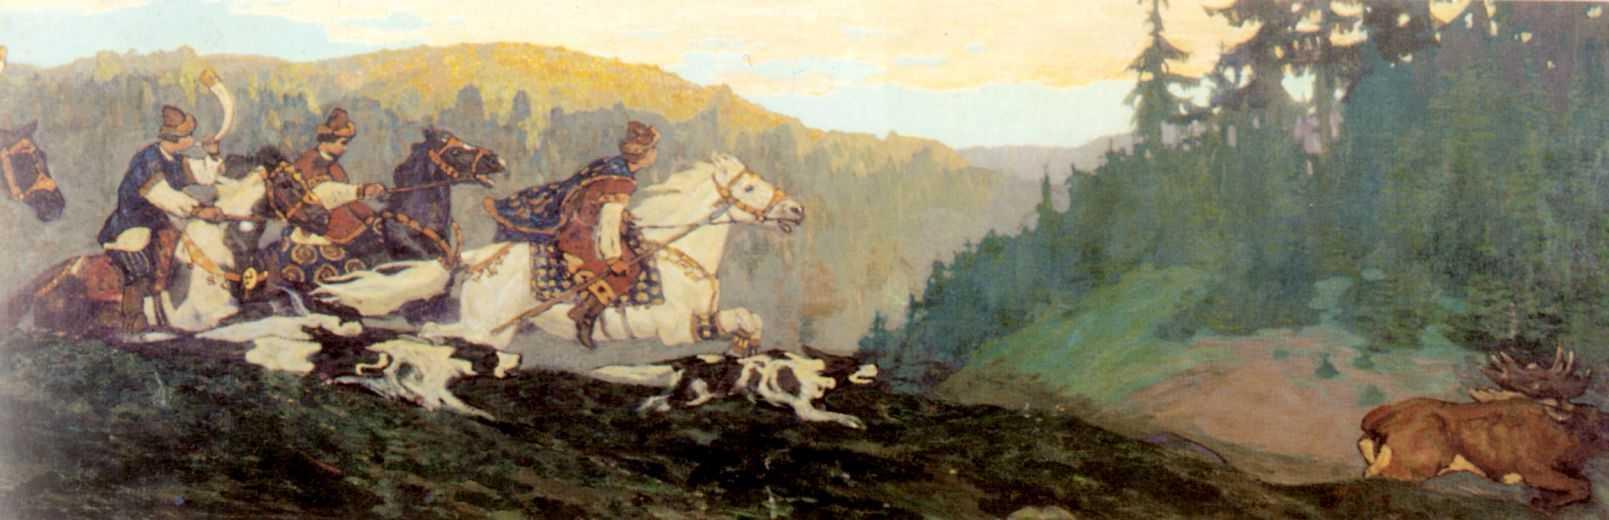 "Николай Рерих ""Утро княжей охоты"", 1901"